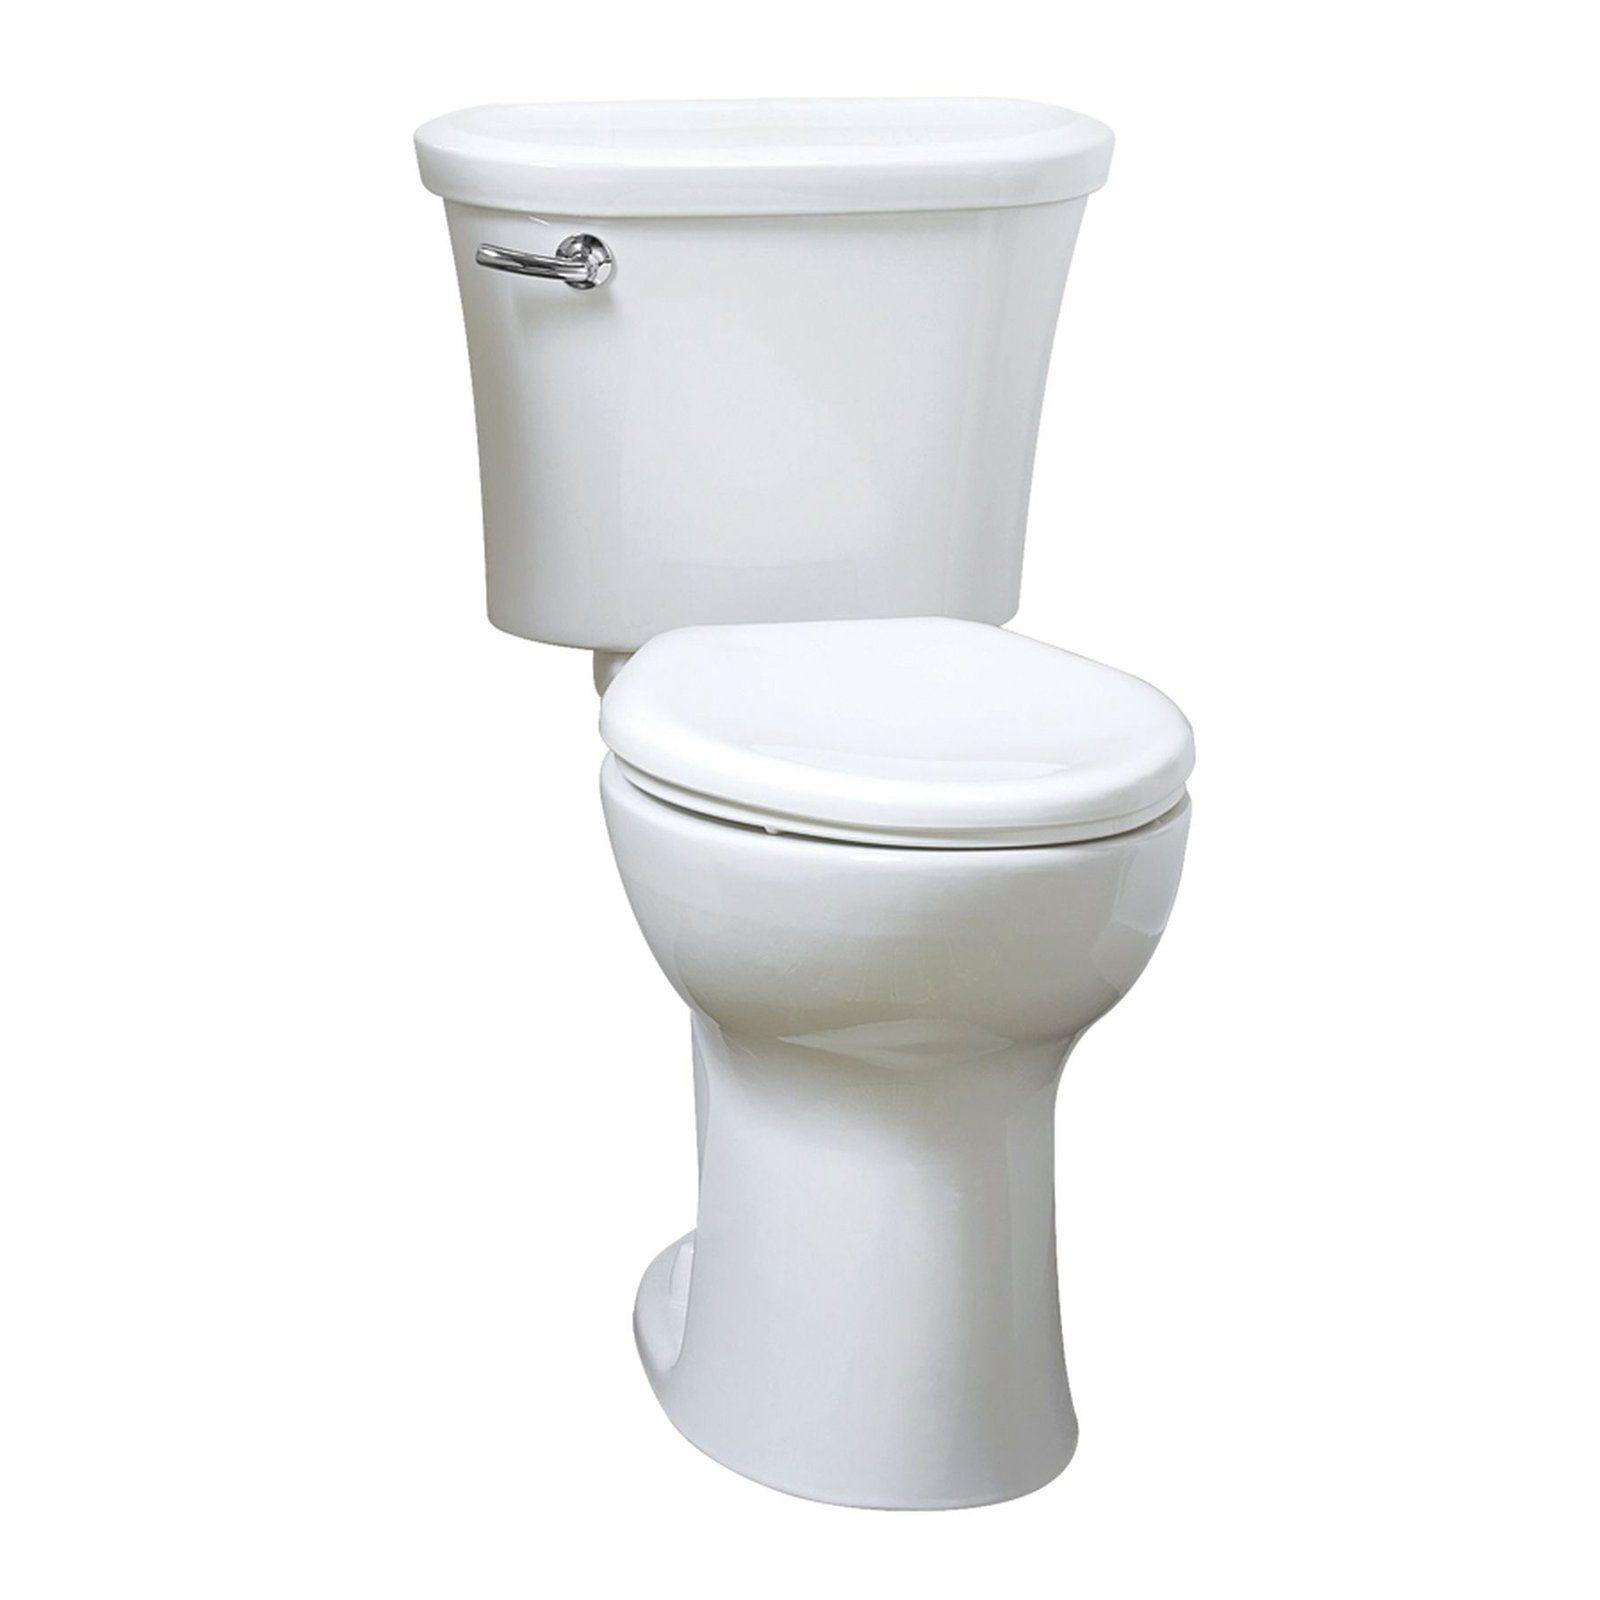 American Standard Tropic Cadet Pro Round Toilet - 217DA.104.222 ...